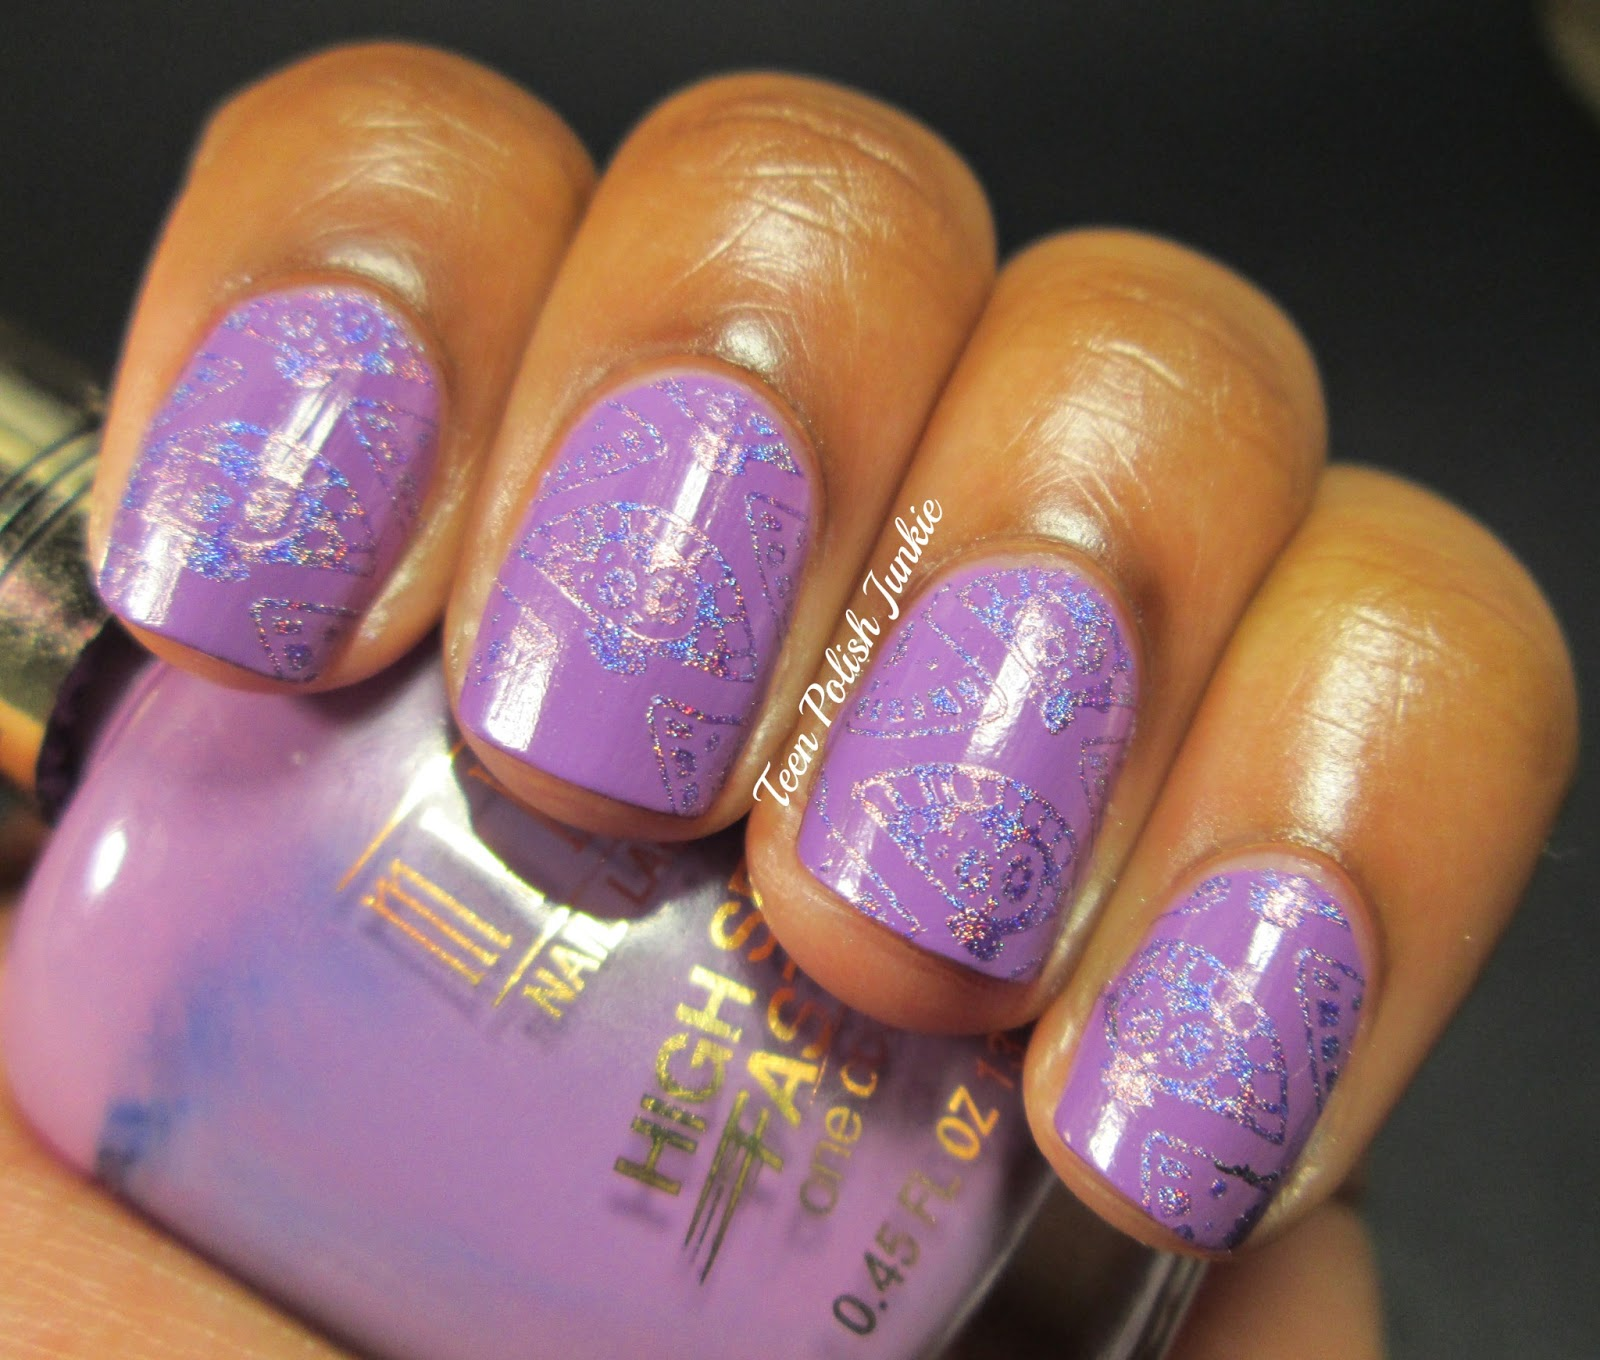 Teen Polish Junkie: Purple Nails for Military Kids